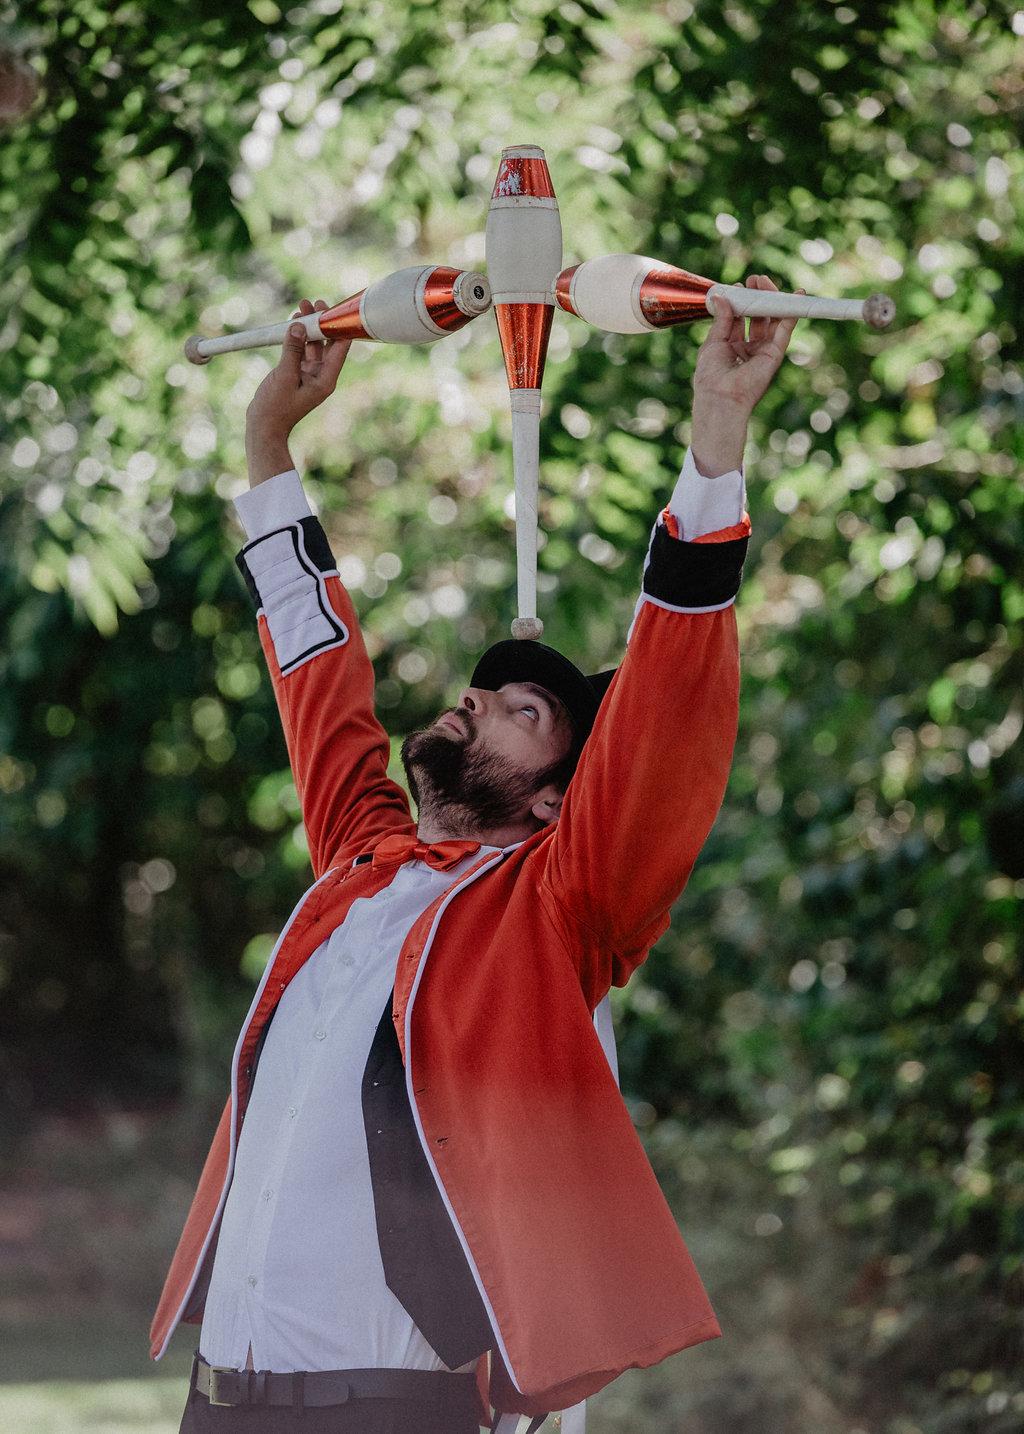 EmilyandGeoff- Nicki Shea Photography- Circus Wedding- act